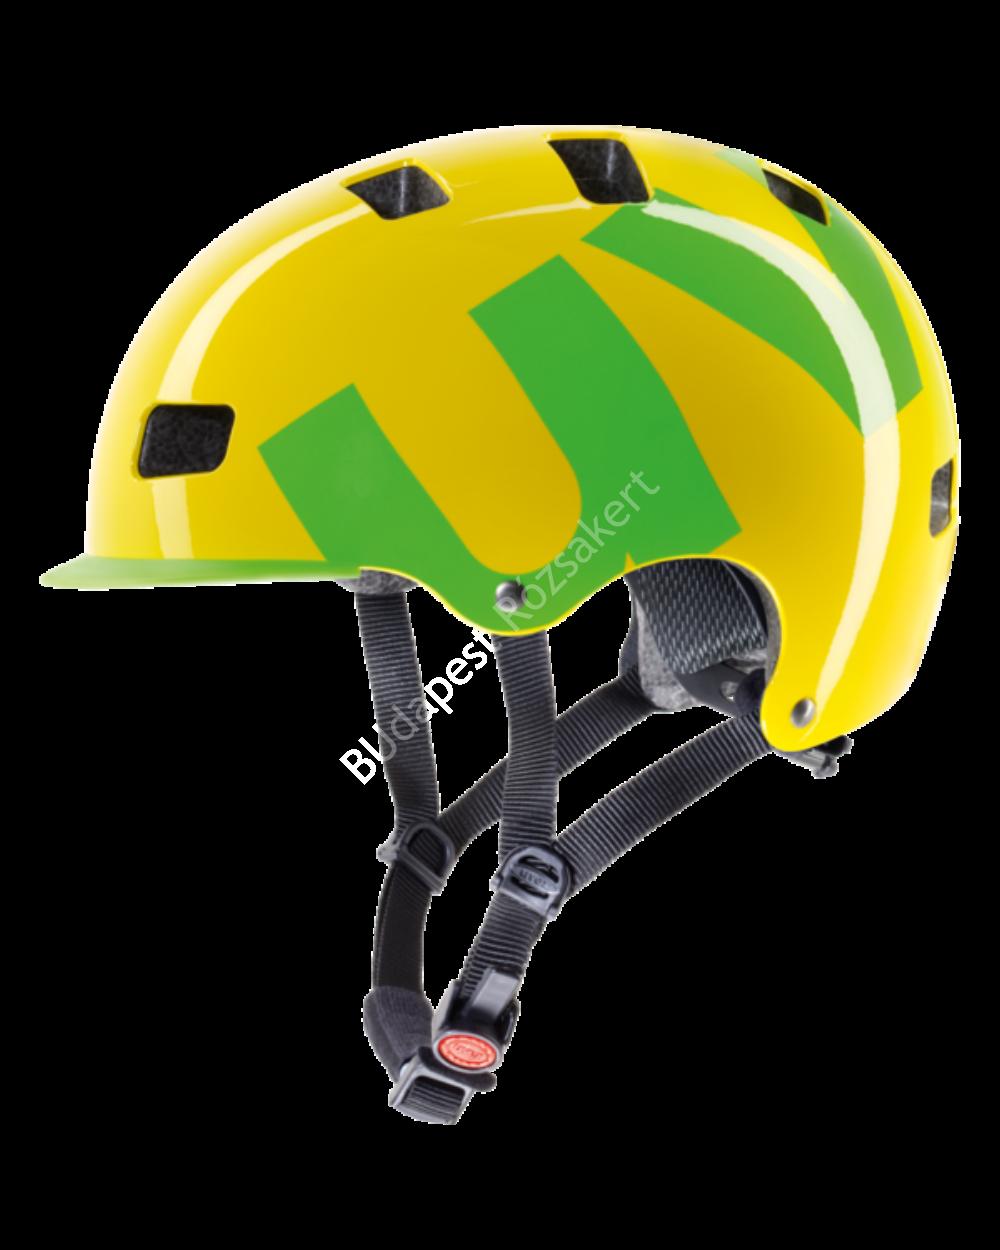 Uvex HLMT 5 bike pro bukósisak, sárga-zöld, 55-58 cm